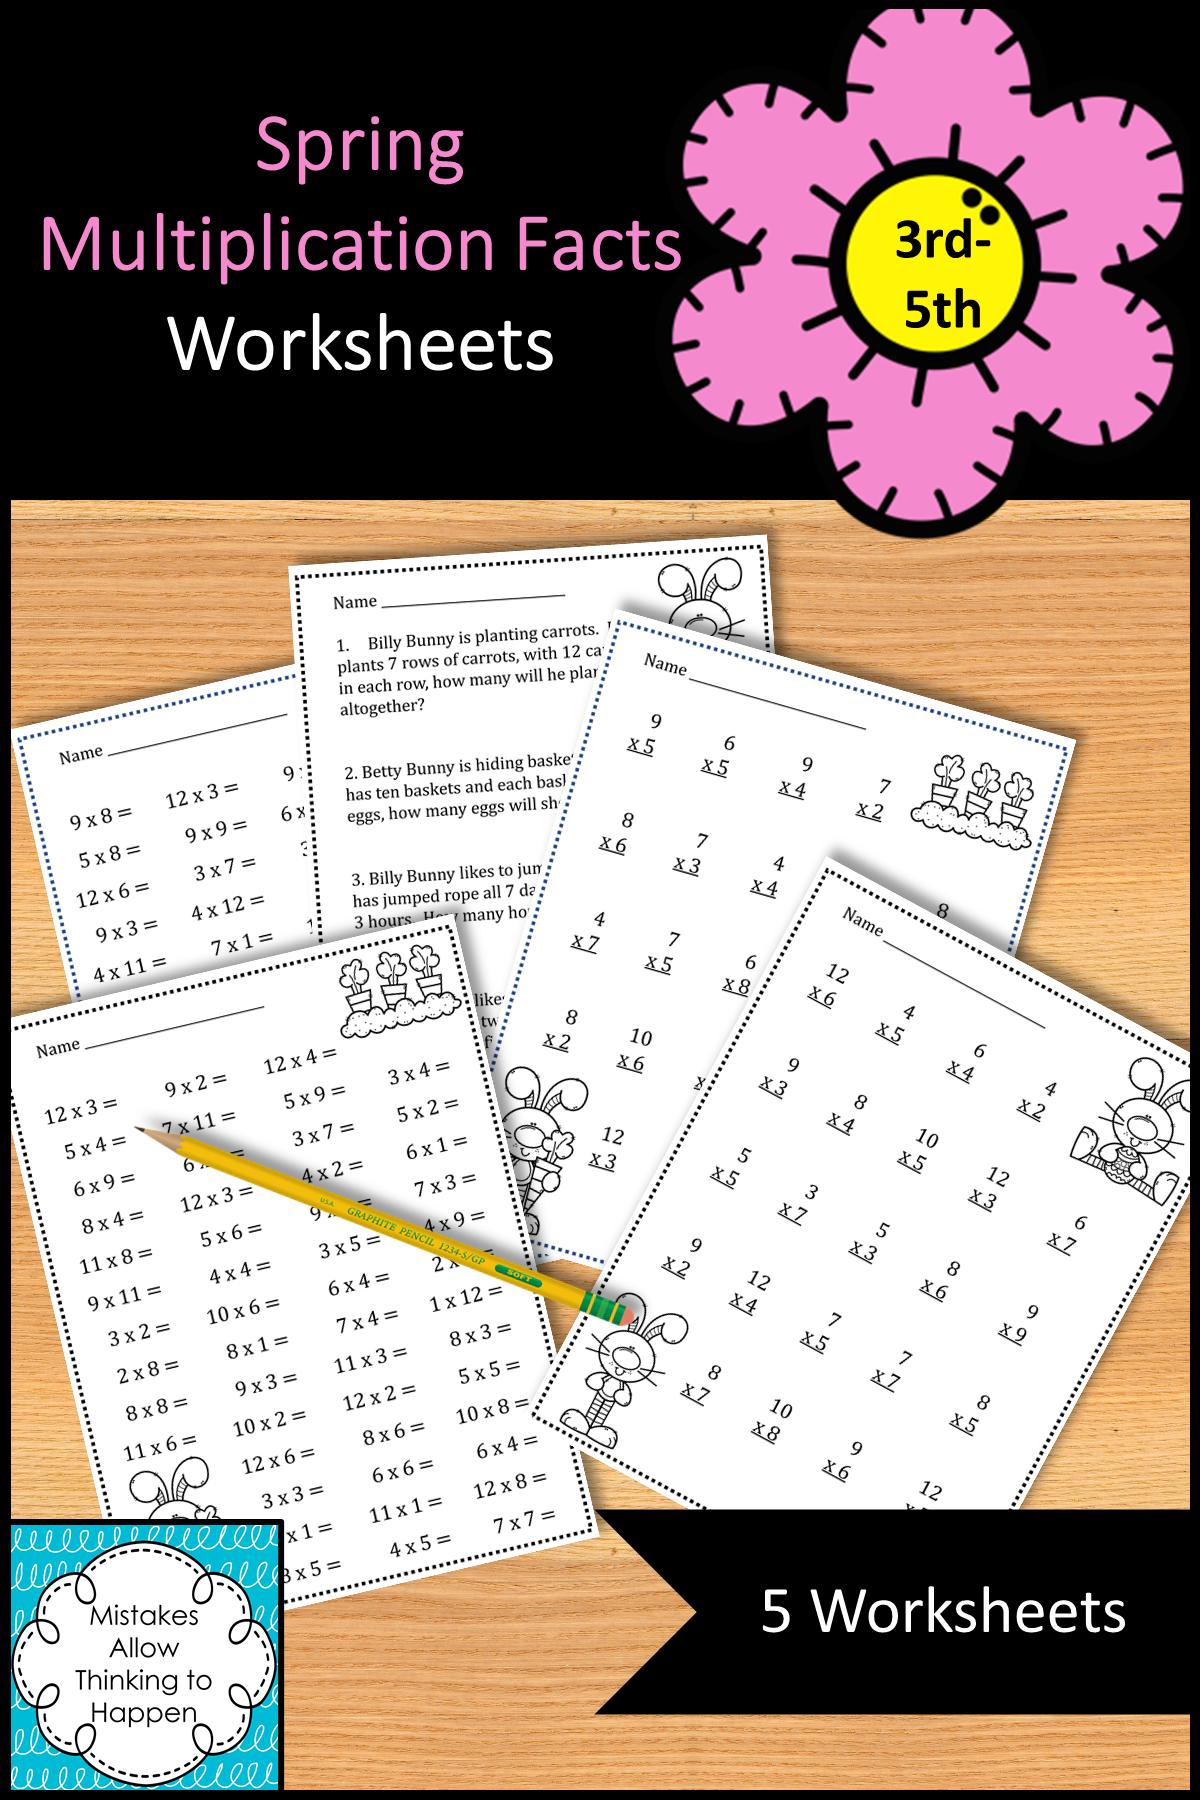 Spring Theme Multiplication Facts Worksheets 5 Worksheets